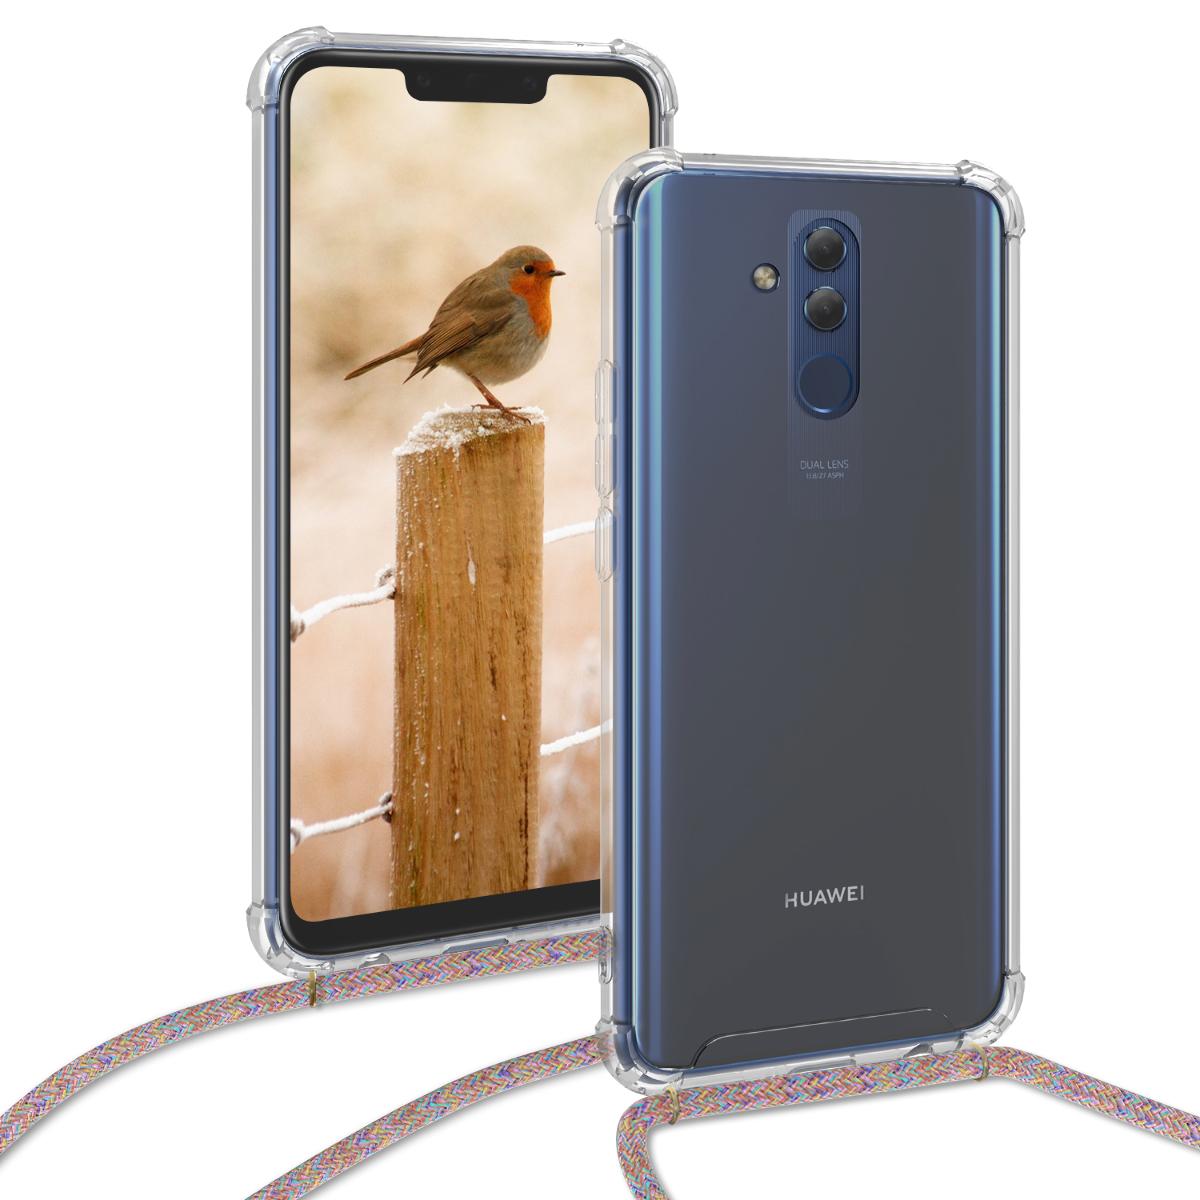 KW Θήκη Σιλικόνης με Λουράκι Λαιμού Huawei Mate 20 Lite - Transparent (47168.32)